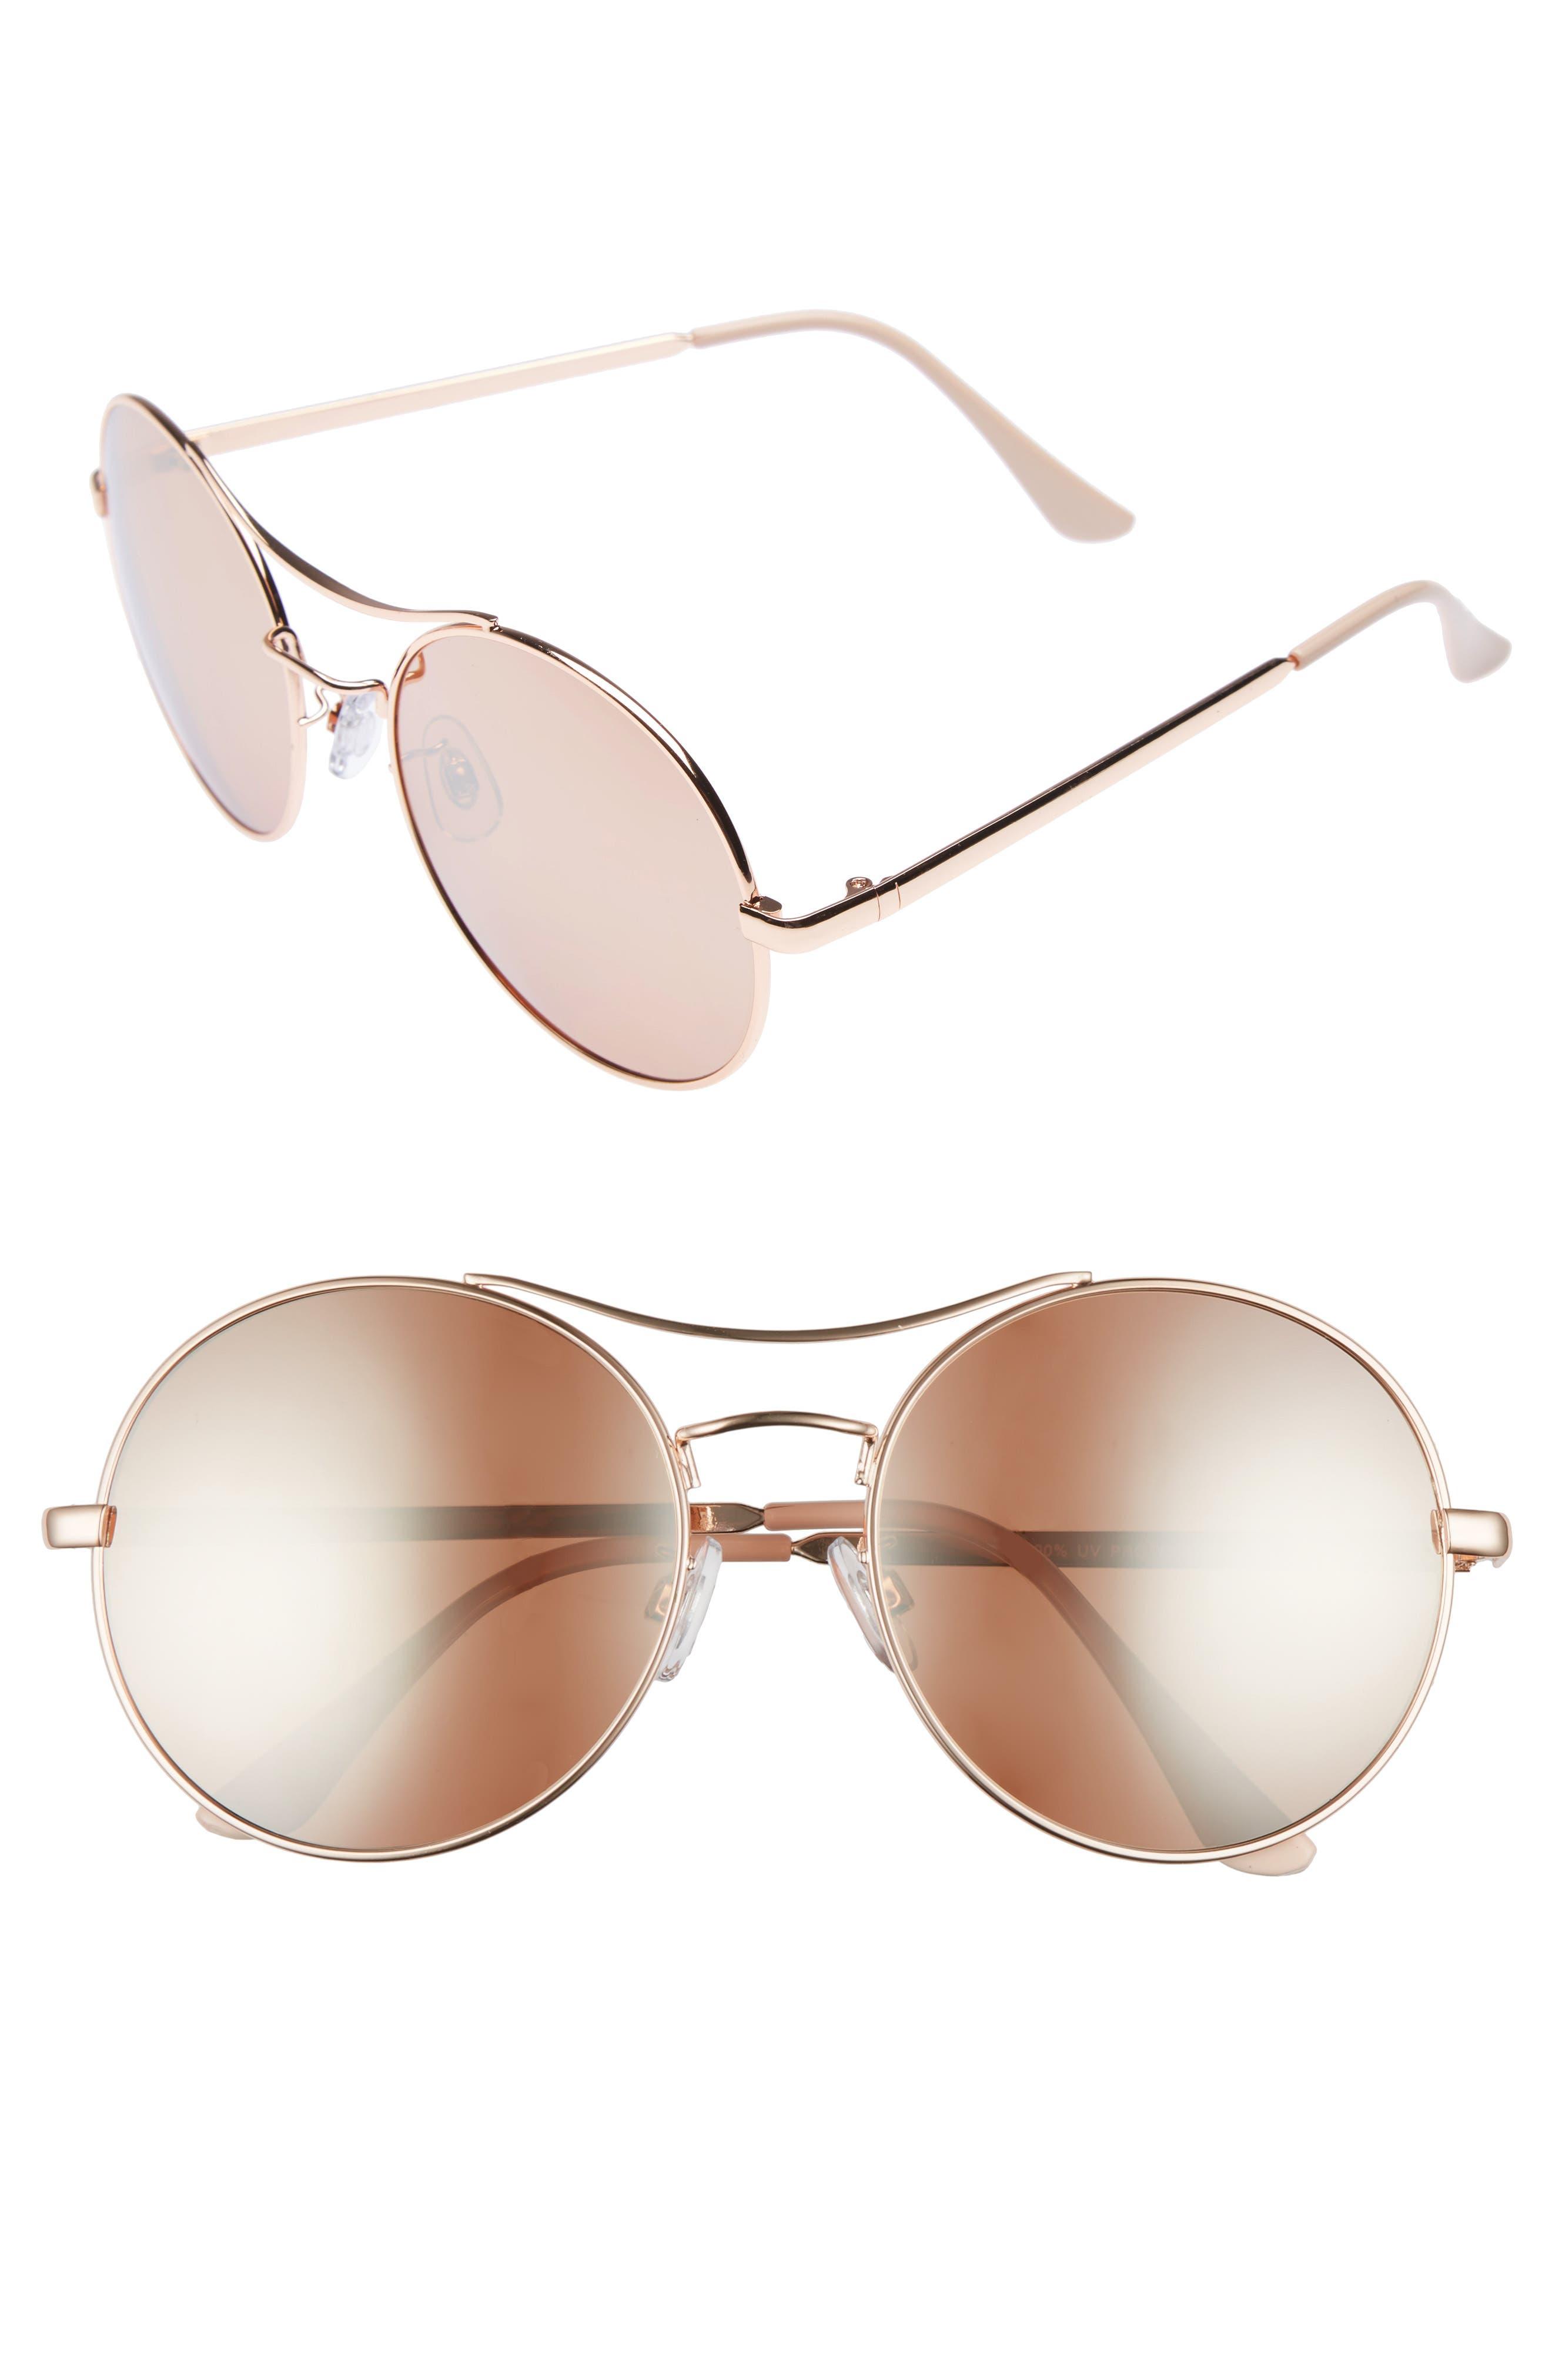 Alternate Image 1 Selected - BP. 58mm Oversize Round Sunglasses